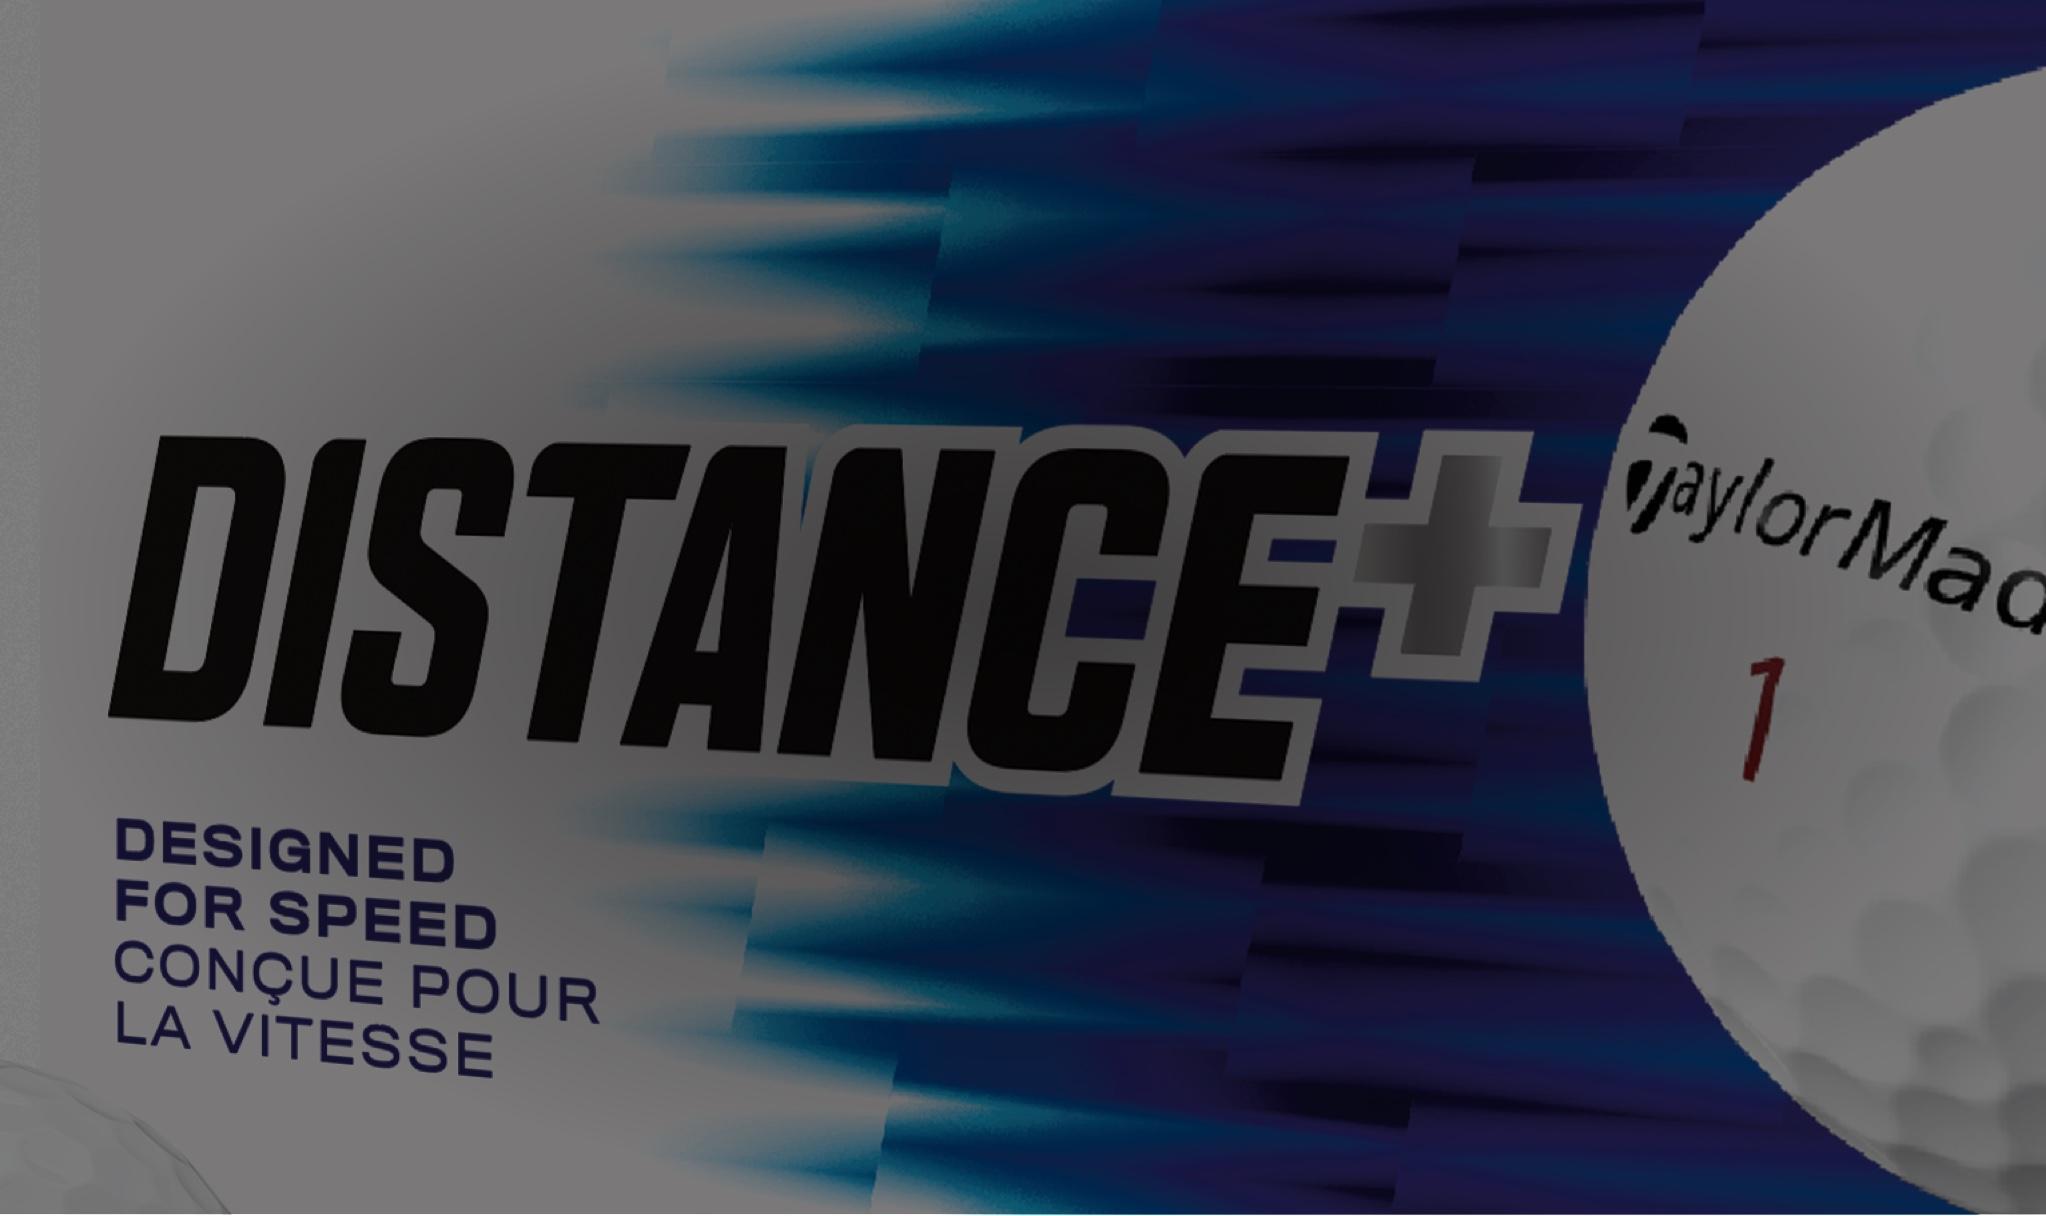 DISTANCE+